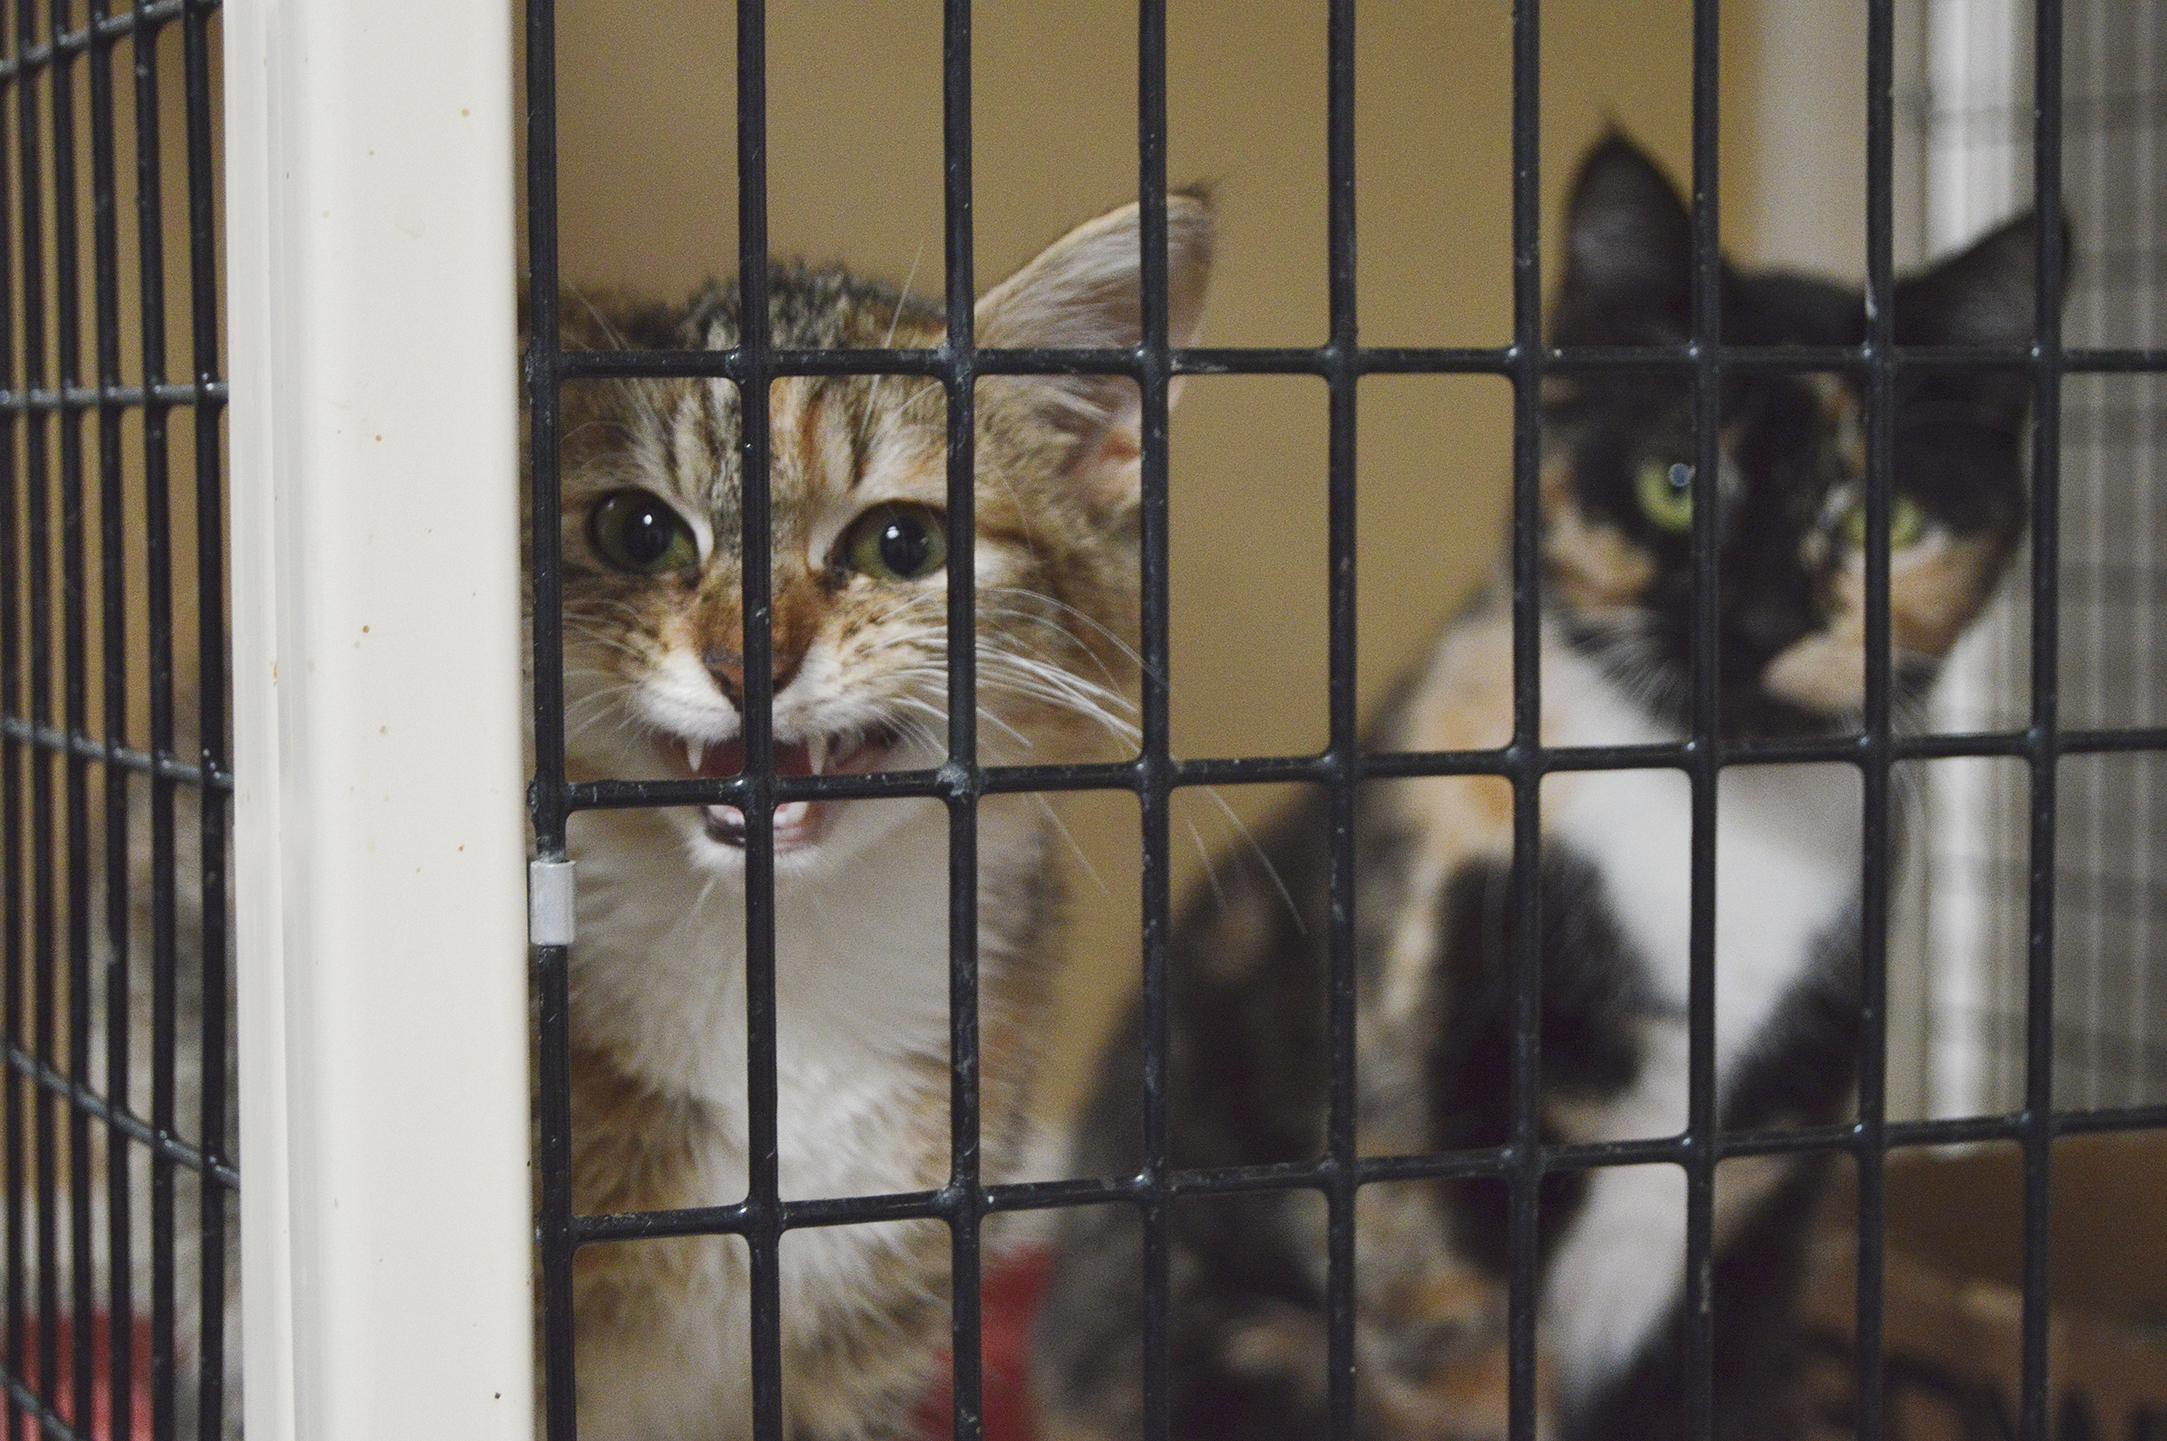 County seeks Humane Society's help with animal control